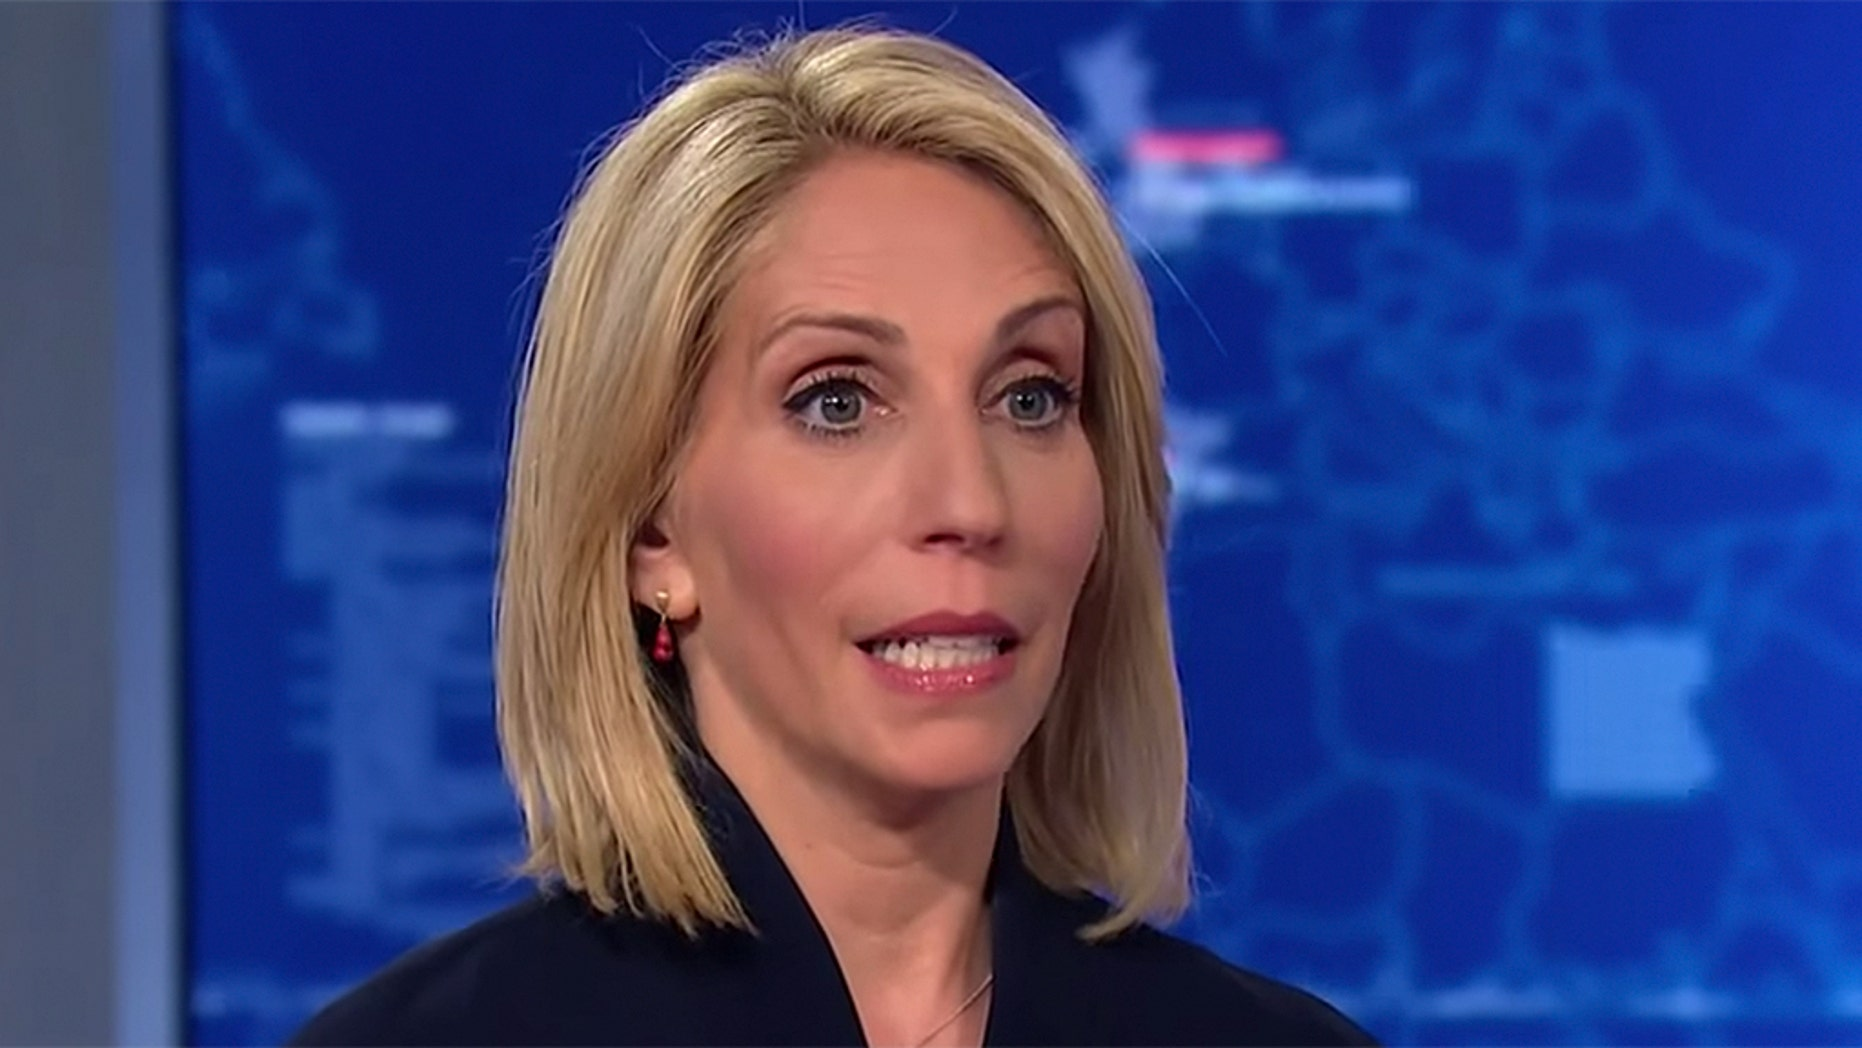 Westlake Legal Group dana-bash-CNN Upcoming NBC political drama enlists CNN reporter Dana Bash for expertise: report fox-news/media fox news fnc/entertainment fnc cd0a1b69-5fba-595b-b699-c62212e474c9 Brian Flood article